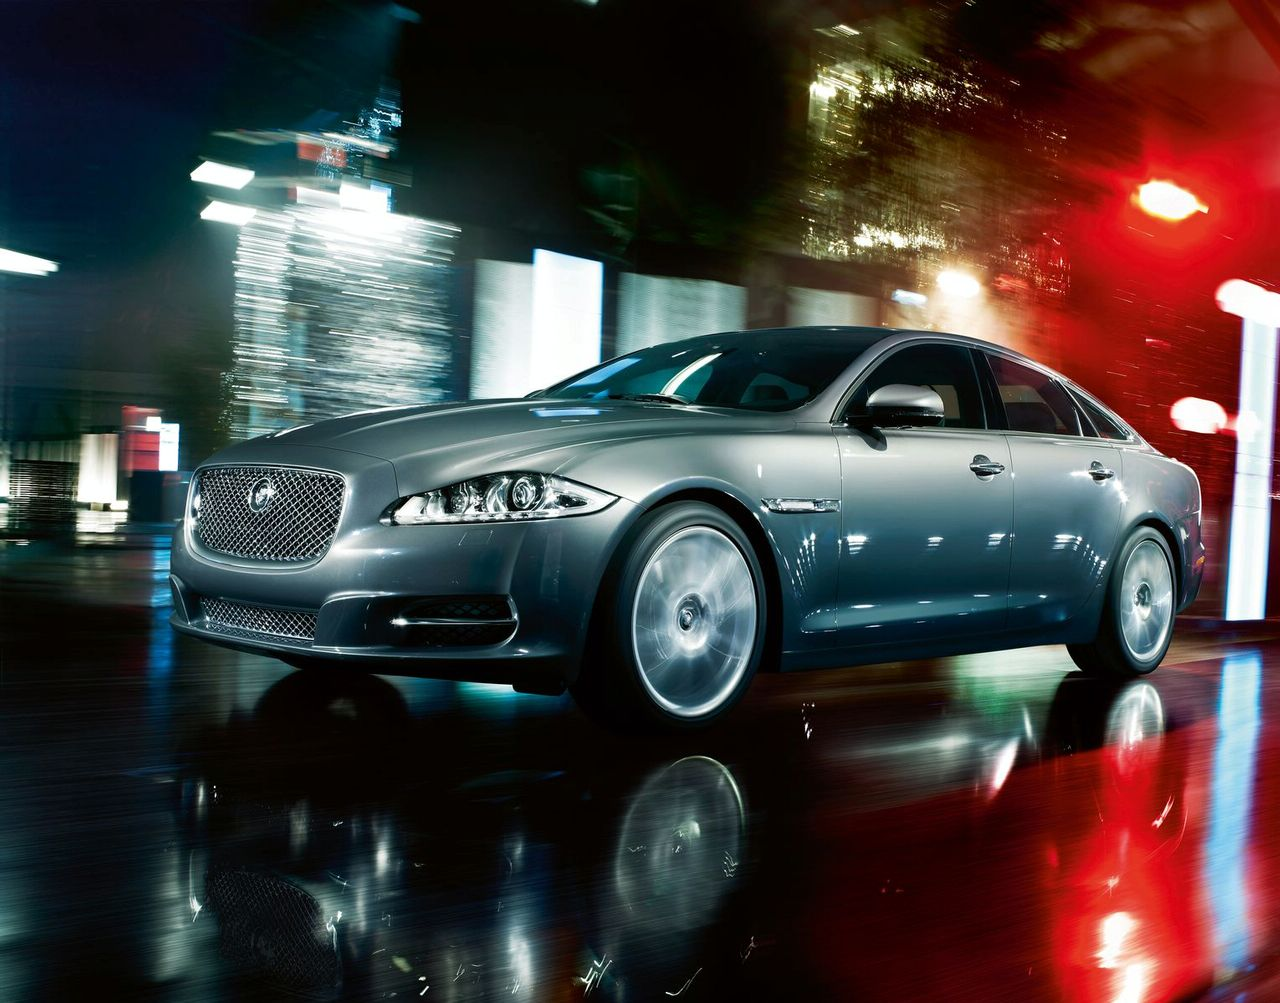 Jaguar XJ 2010 img_9 | It's your auto world :: New cars, auto news